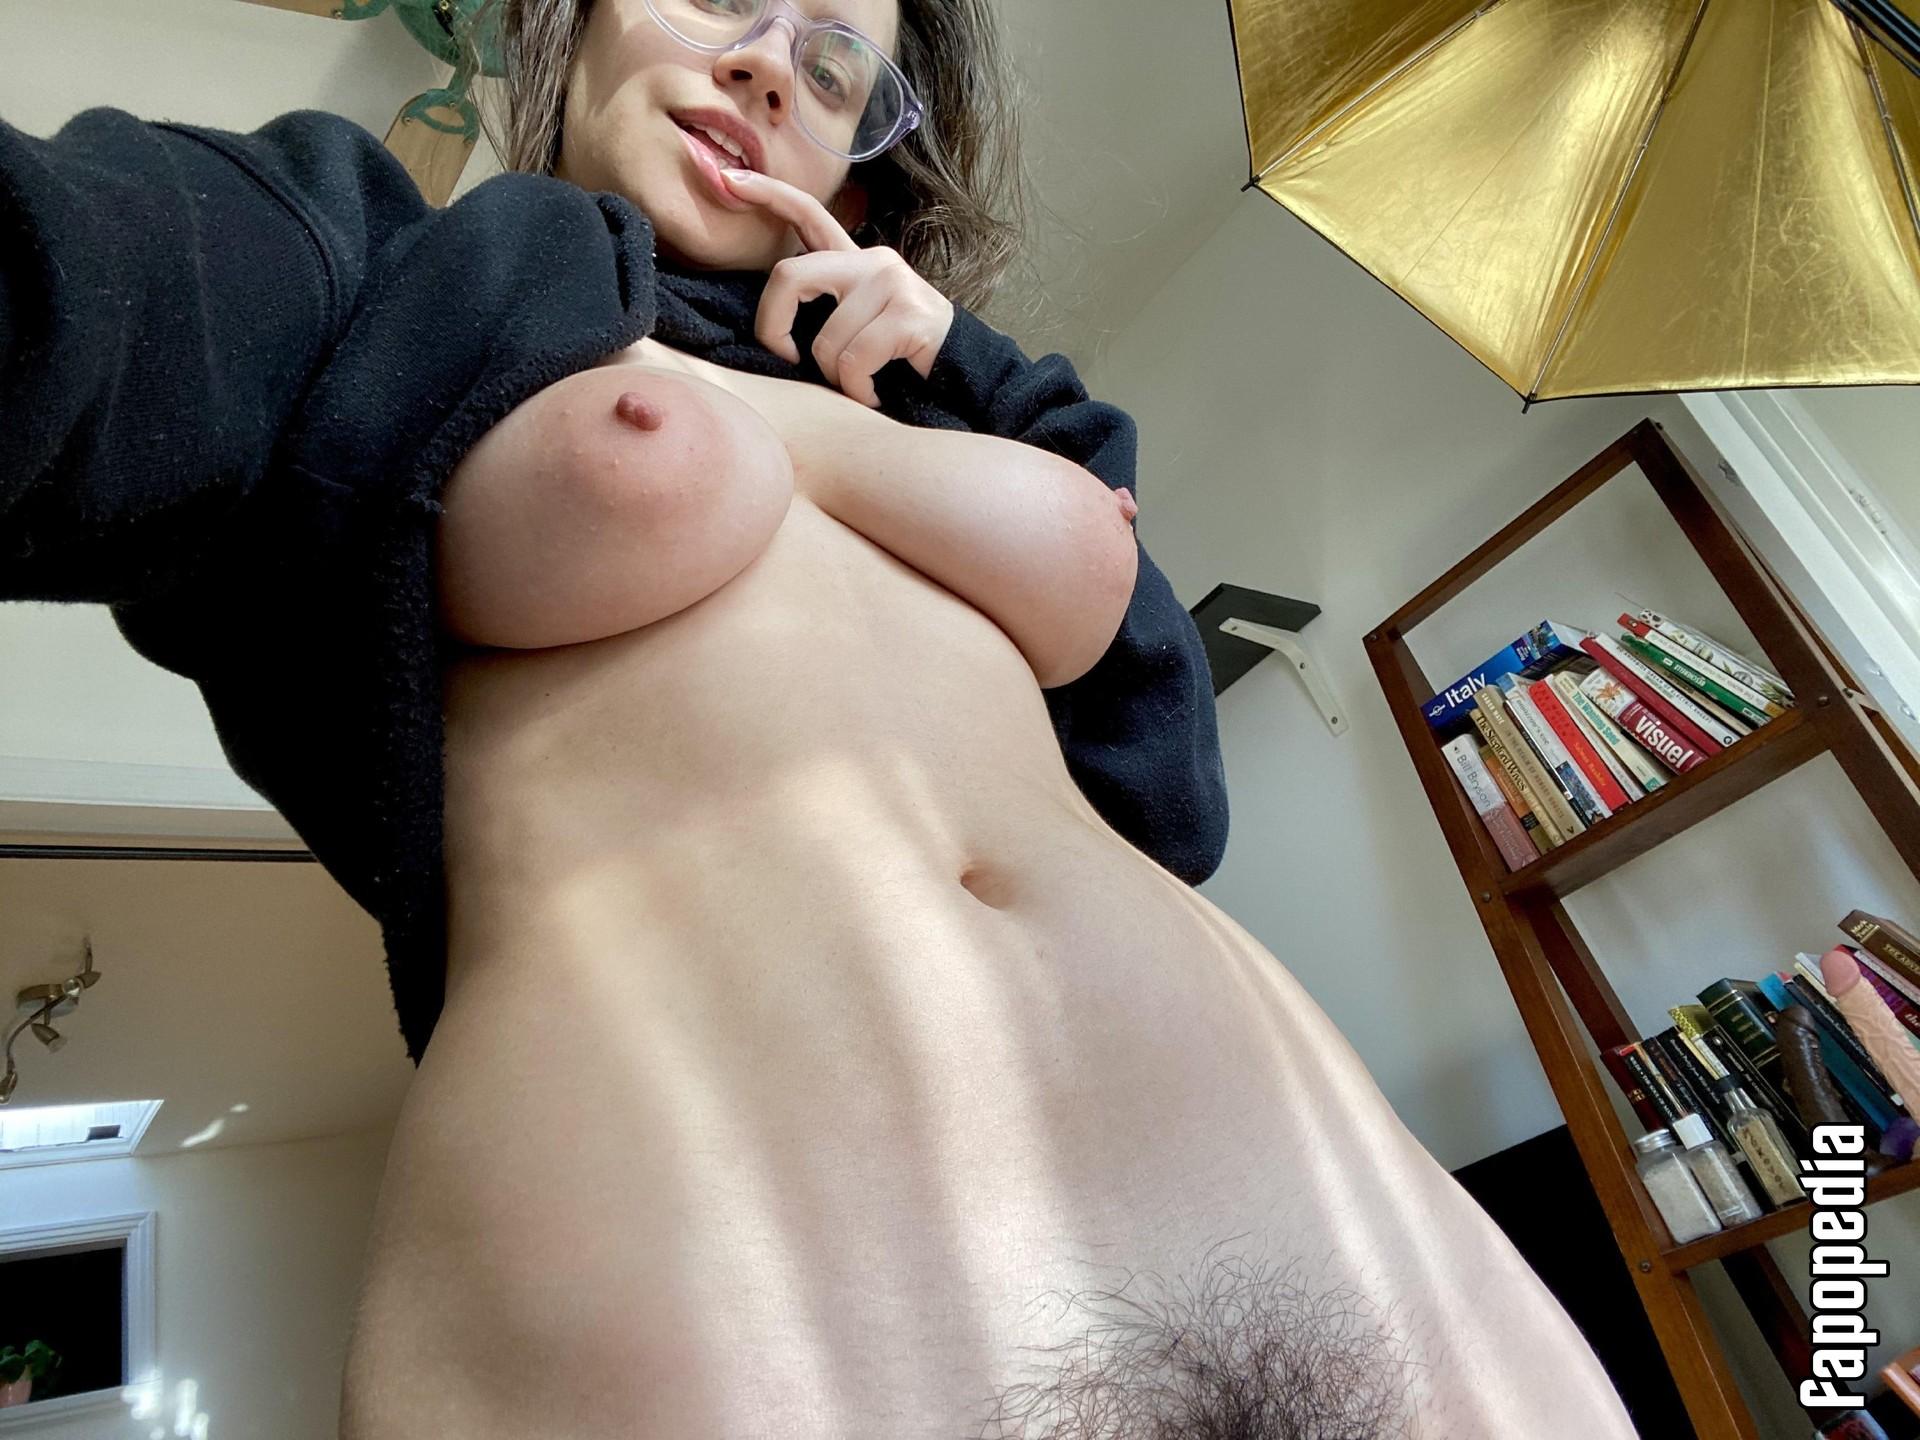 Quinnfinite Nude OnlyFans Leaks